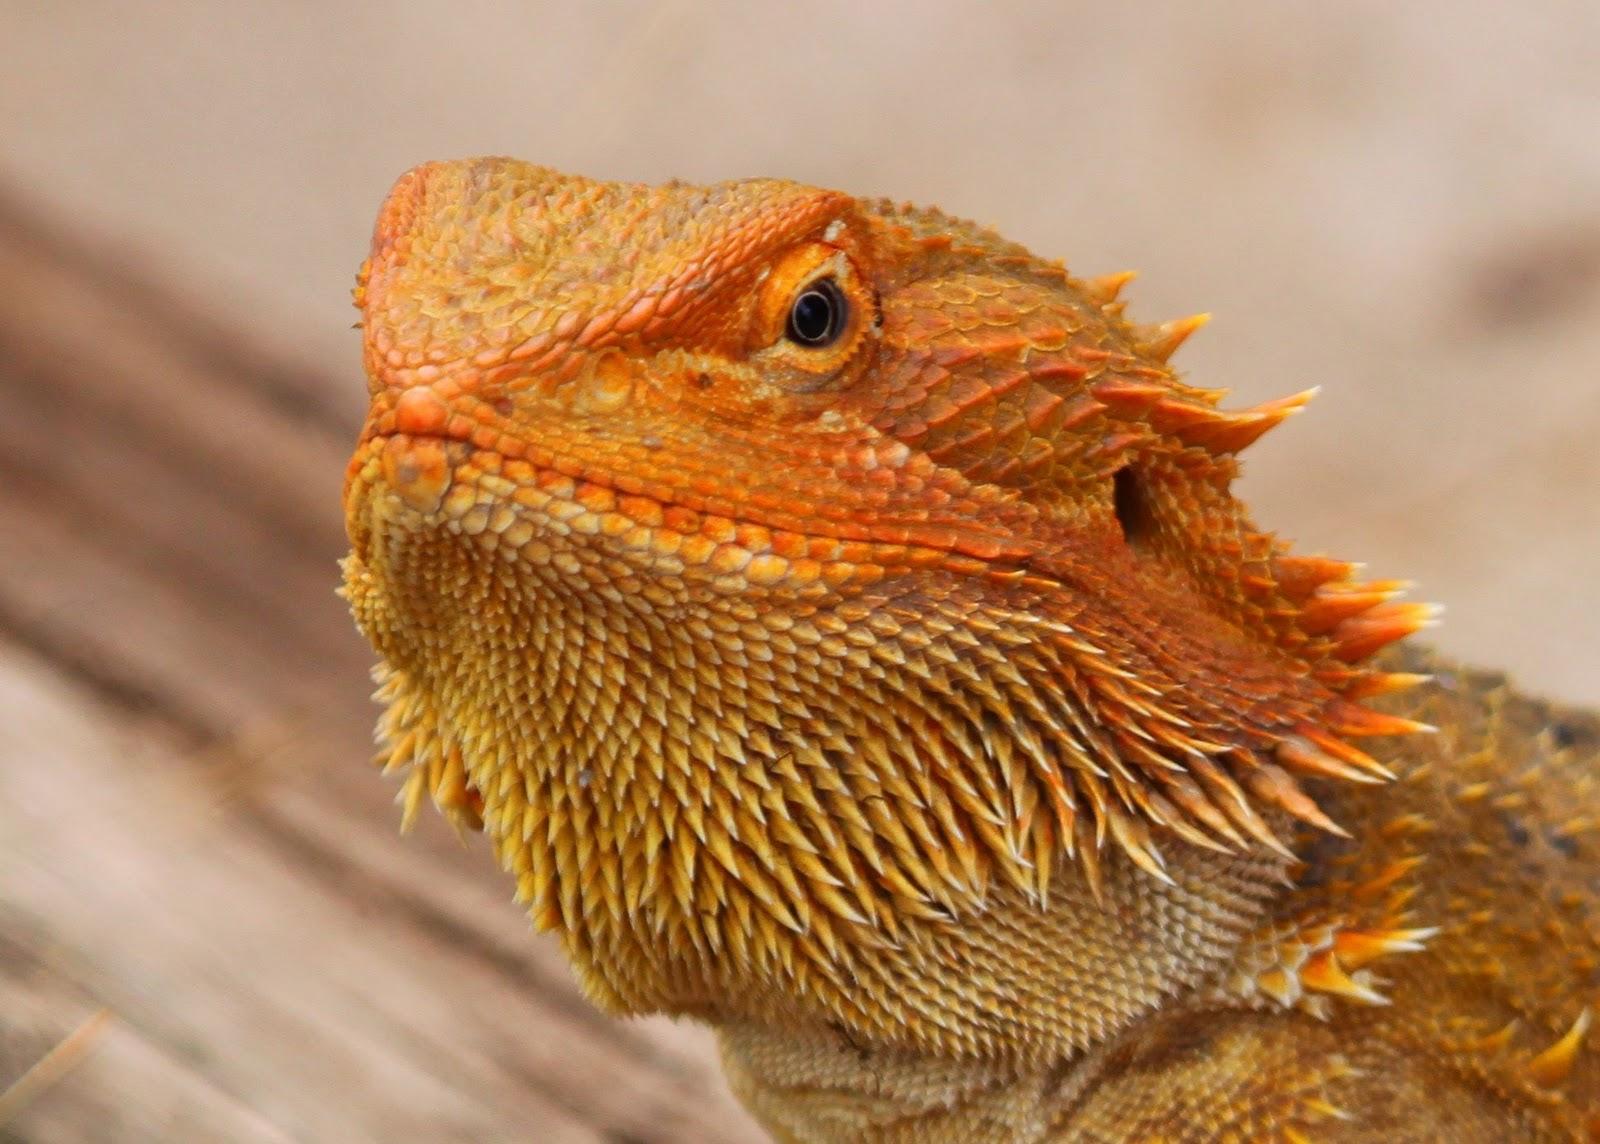 Richard Waring's Birds of Australia: Bearded Dragon eats ...